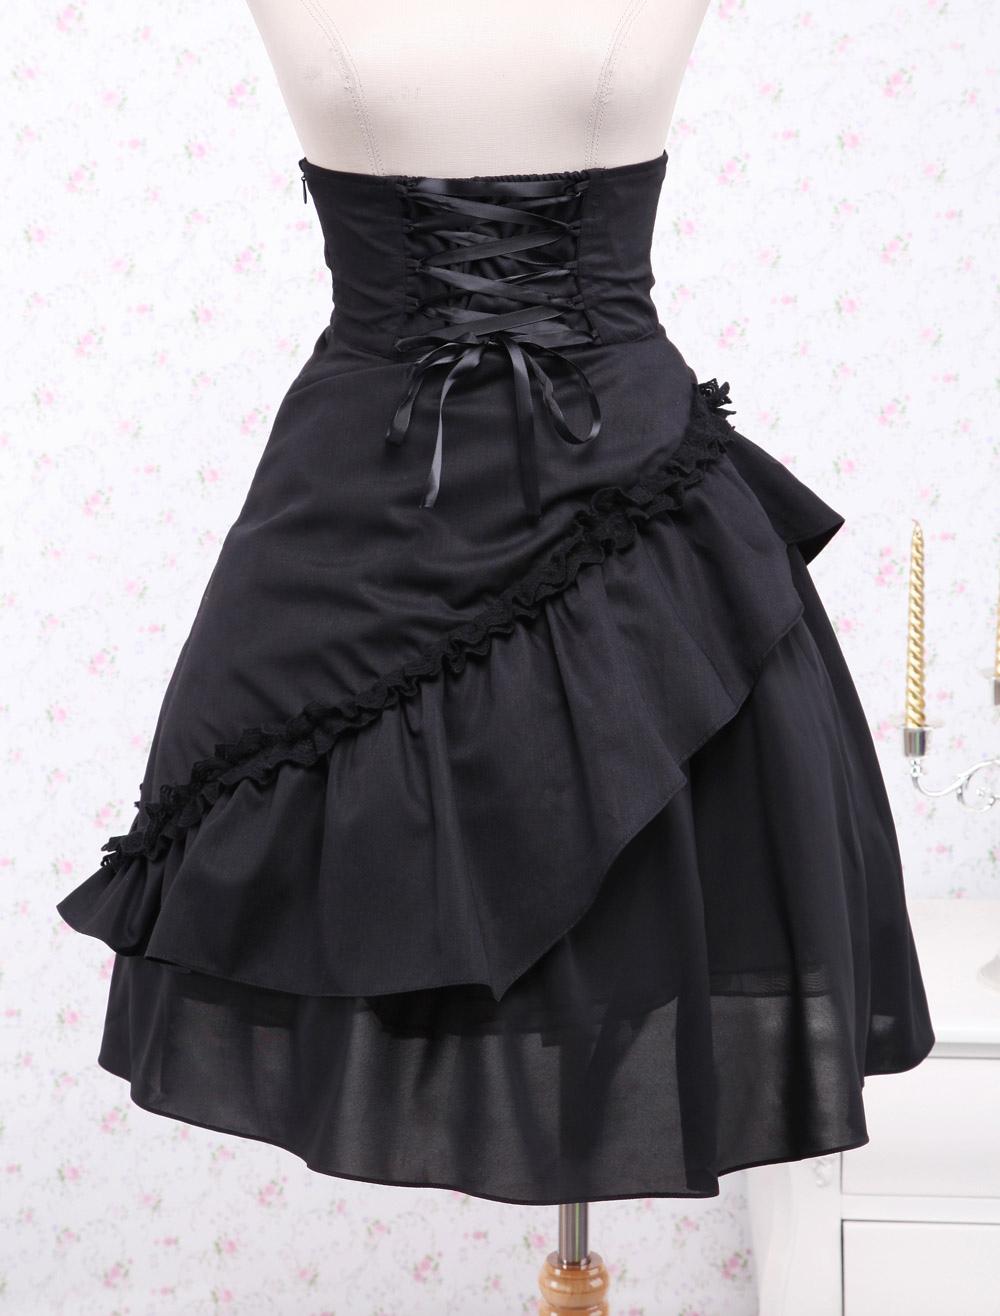 Buy Gothic Lolita Dress SK Black Ruffles High Waist Lace Up Lolita Skirt for $46.39 in Milanoo store